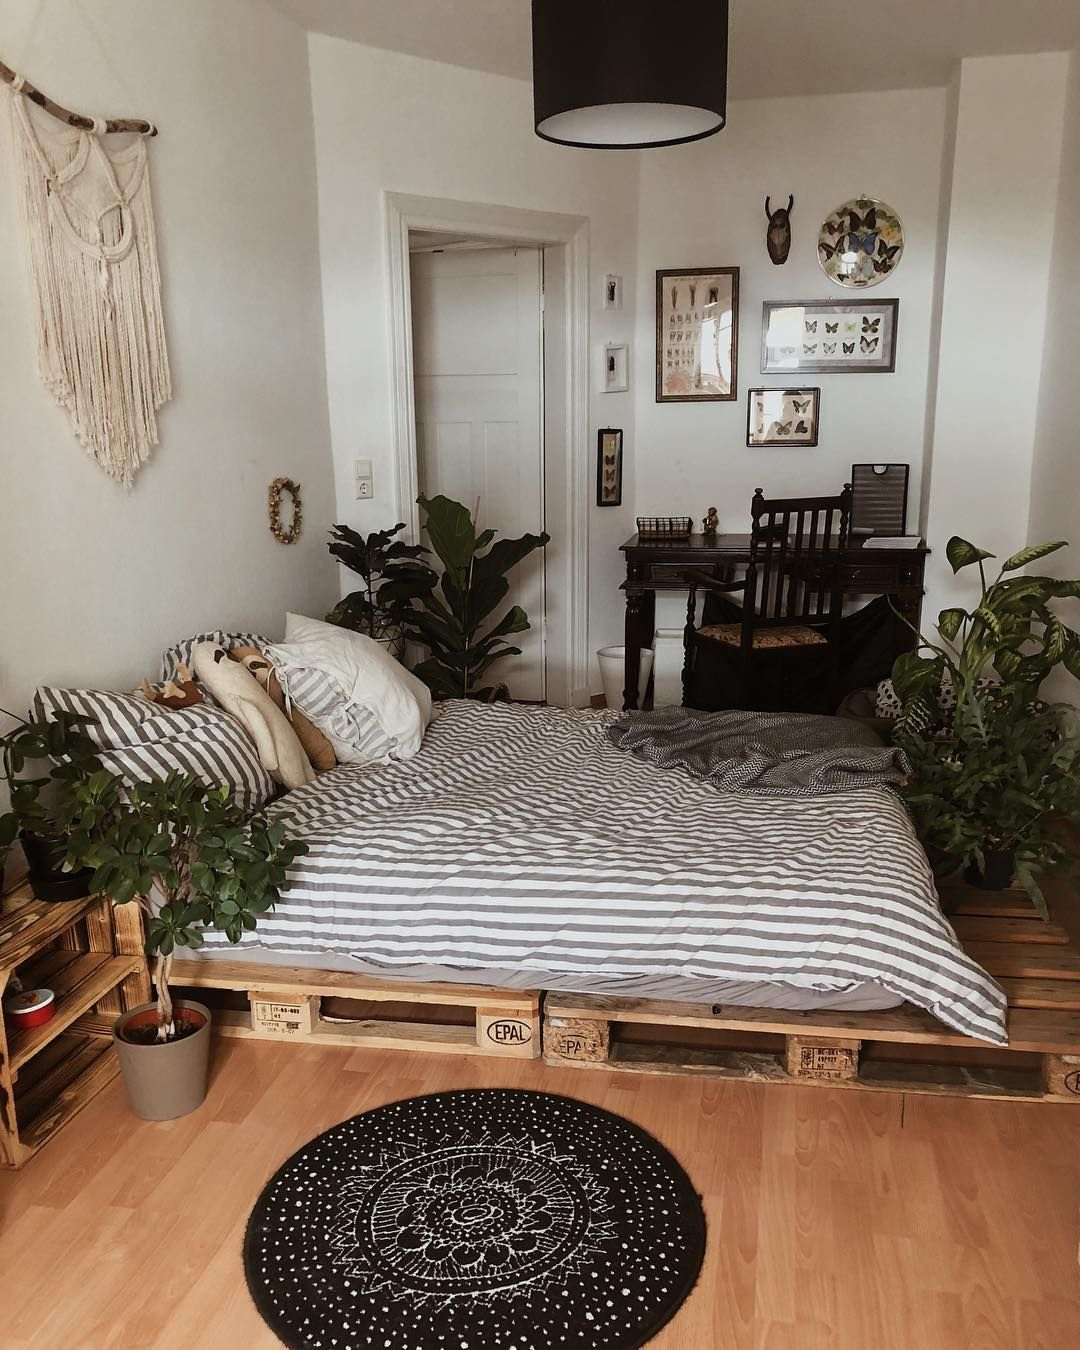 Kleiner Dschungel  home greenliving inspiration